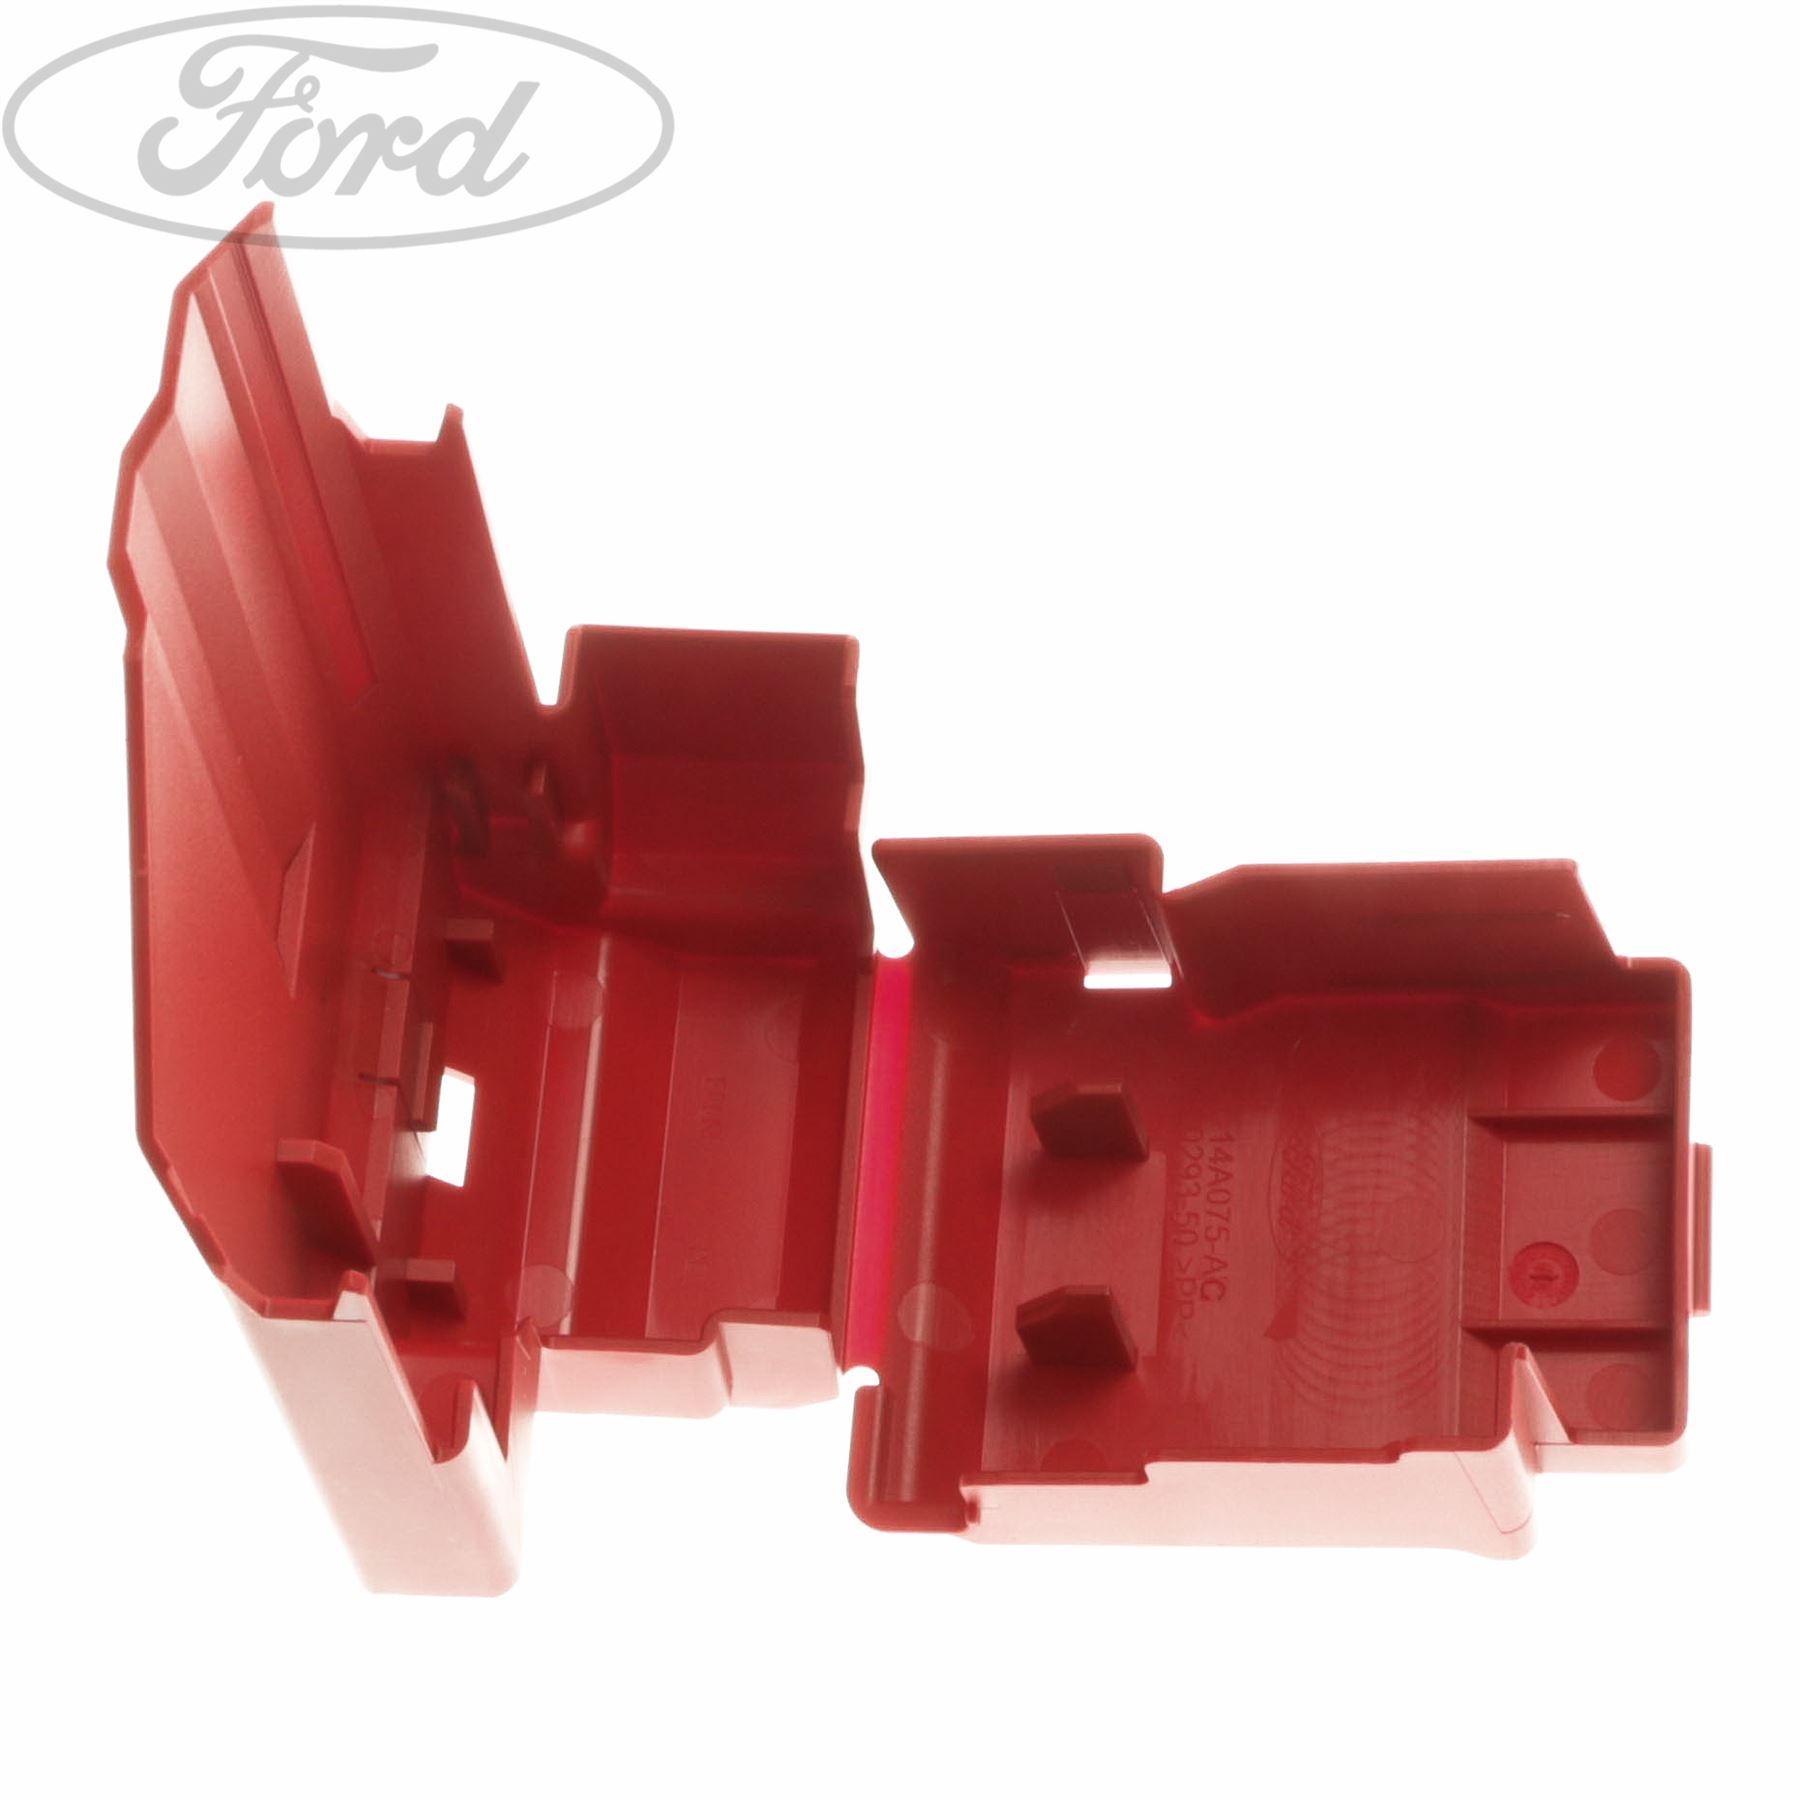 Genuine Ford Fiesta Mk7 Fuse Box Cover 1832217 Ebay Diagram